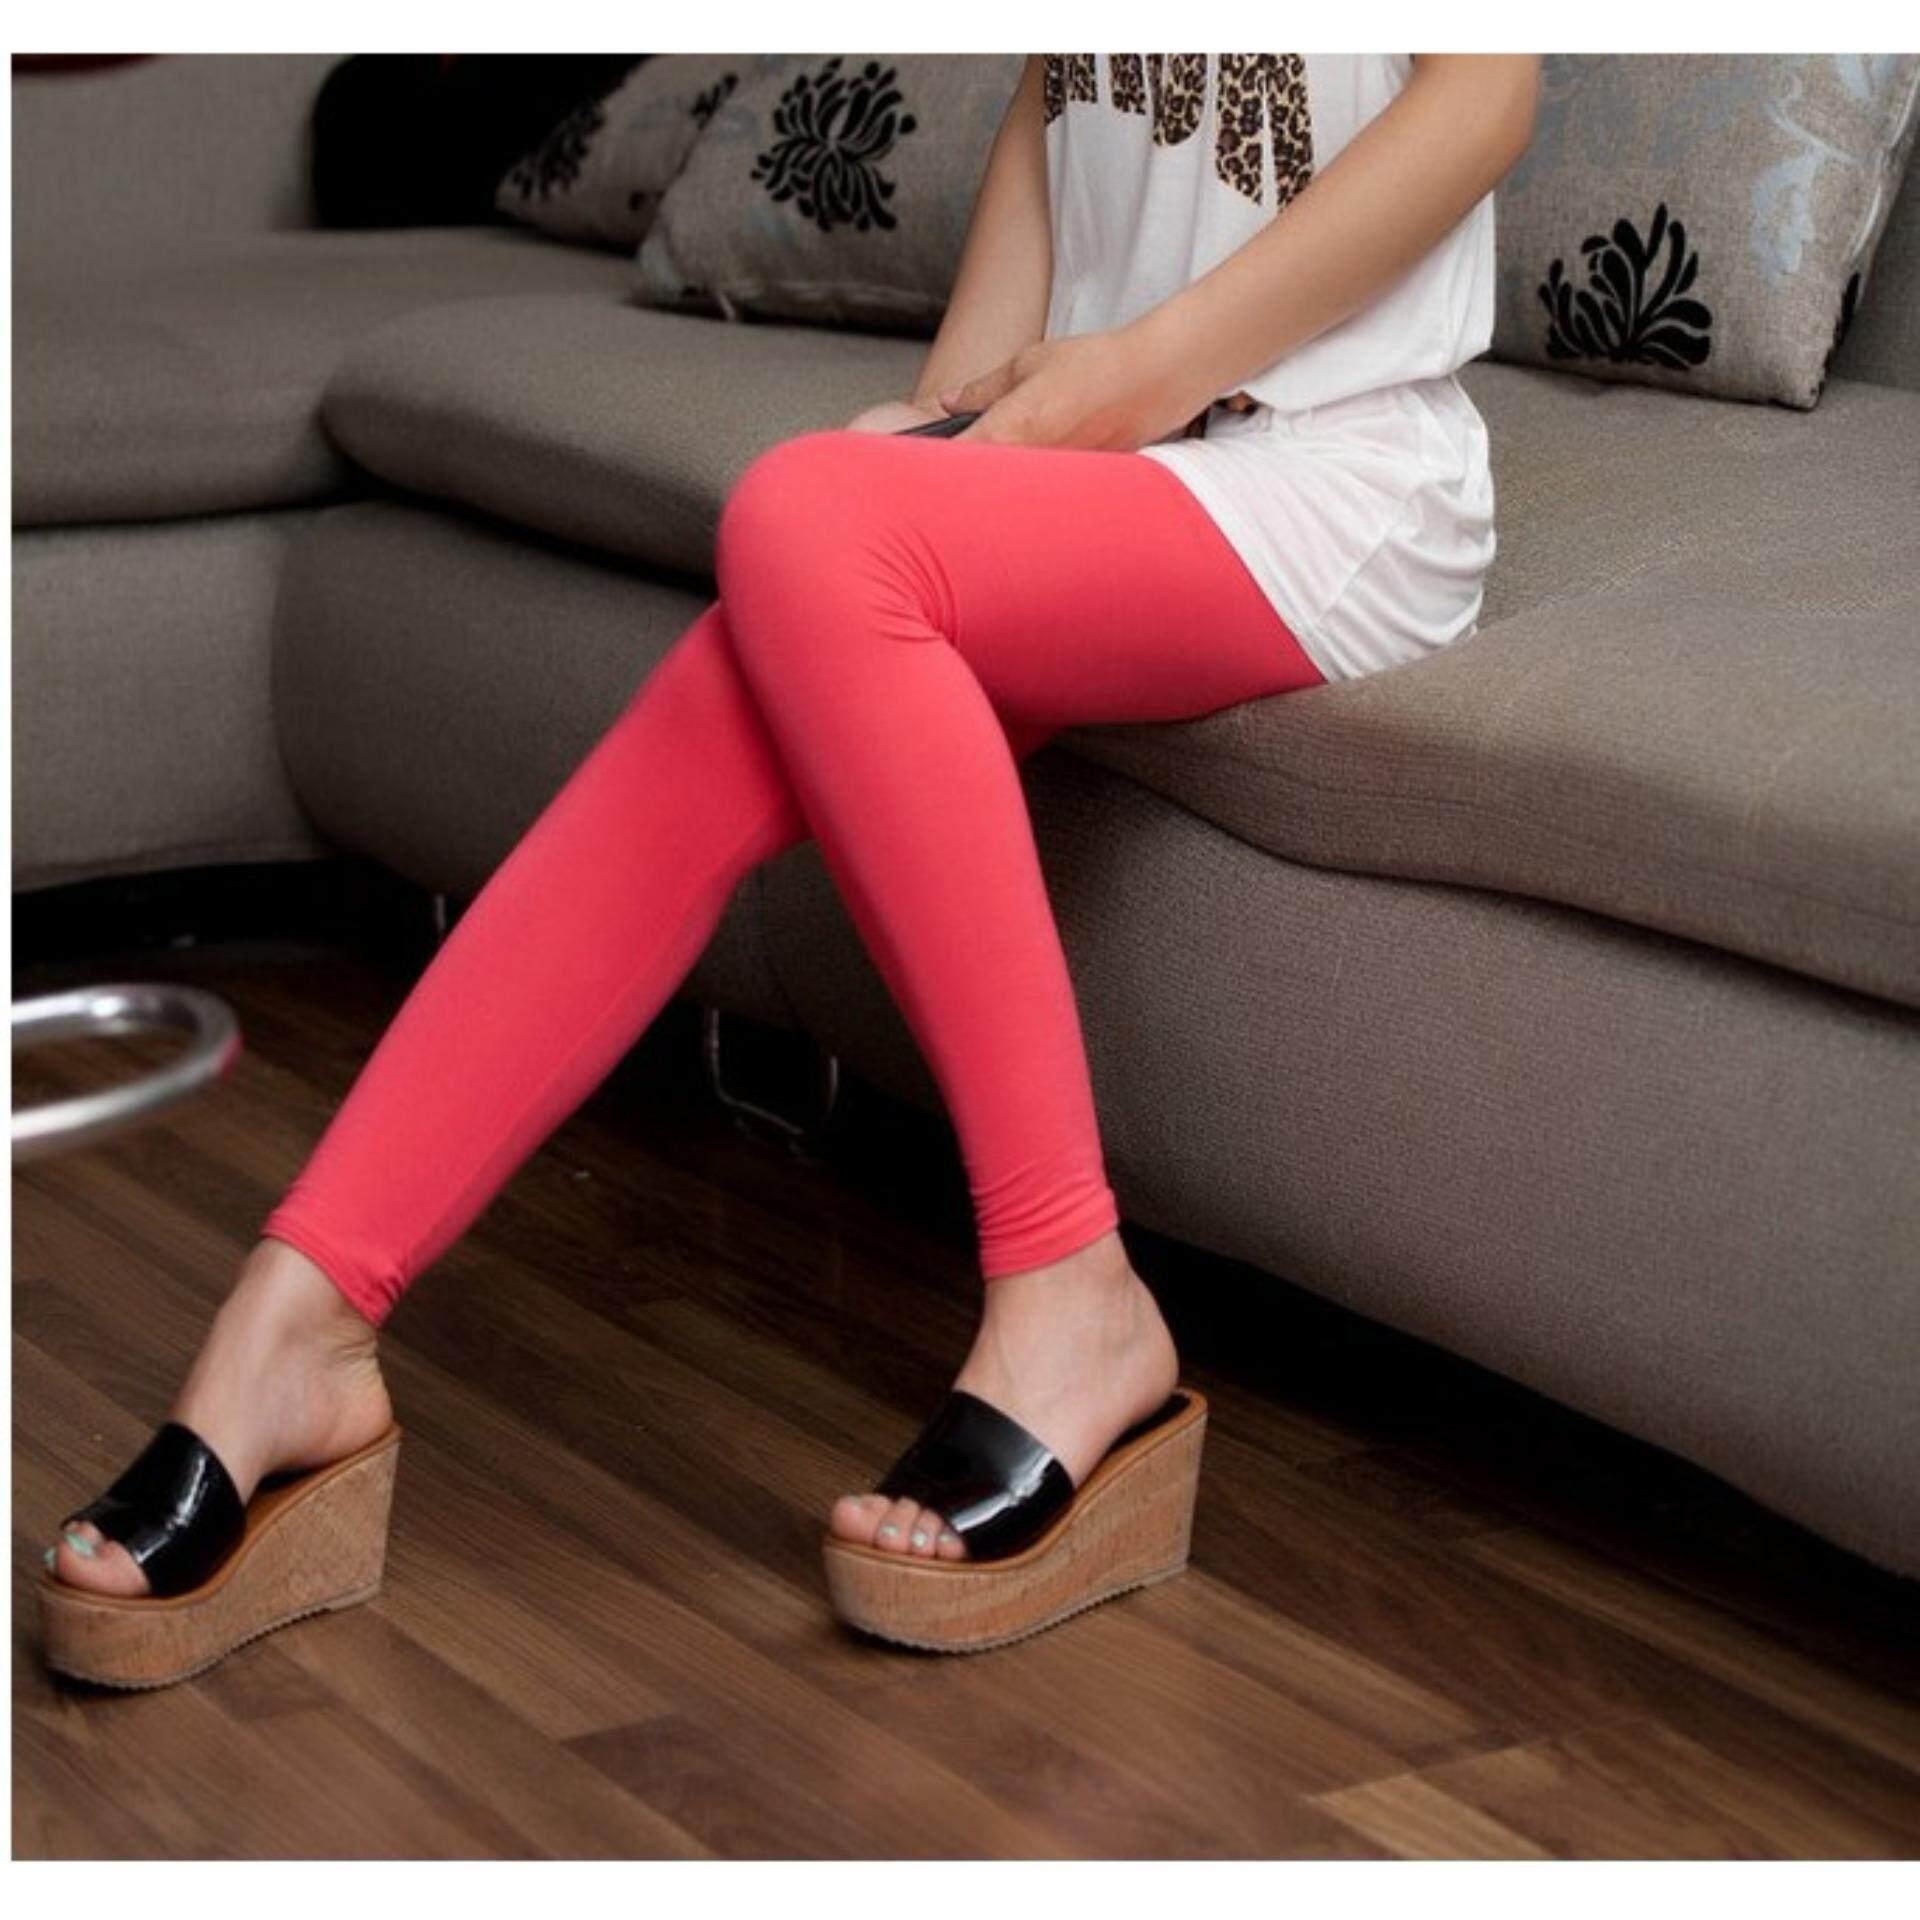 Colorful Modal Leggings - Melon Red